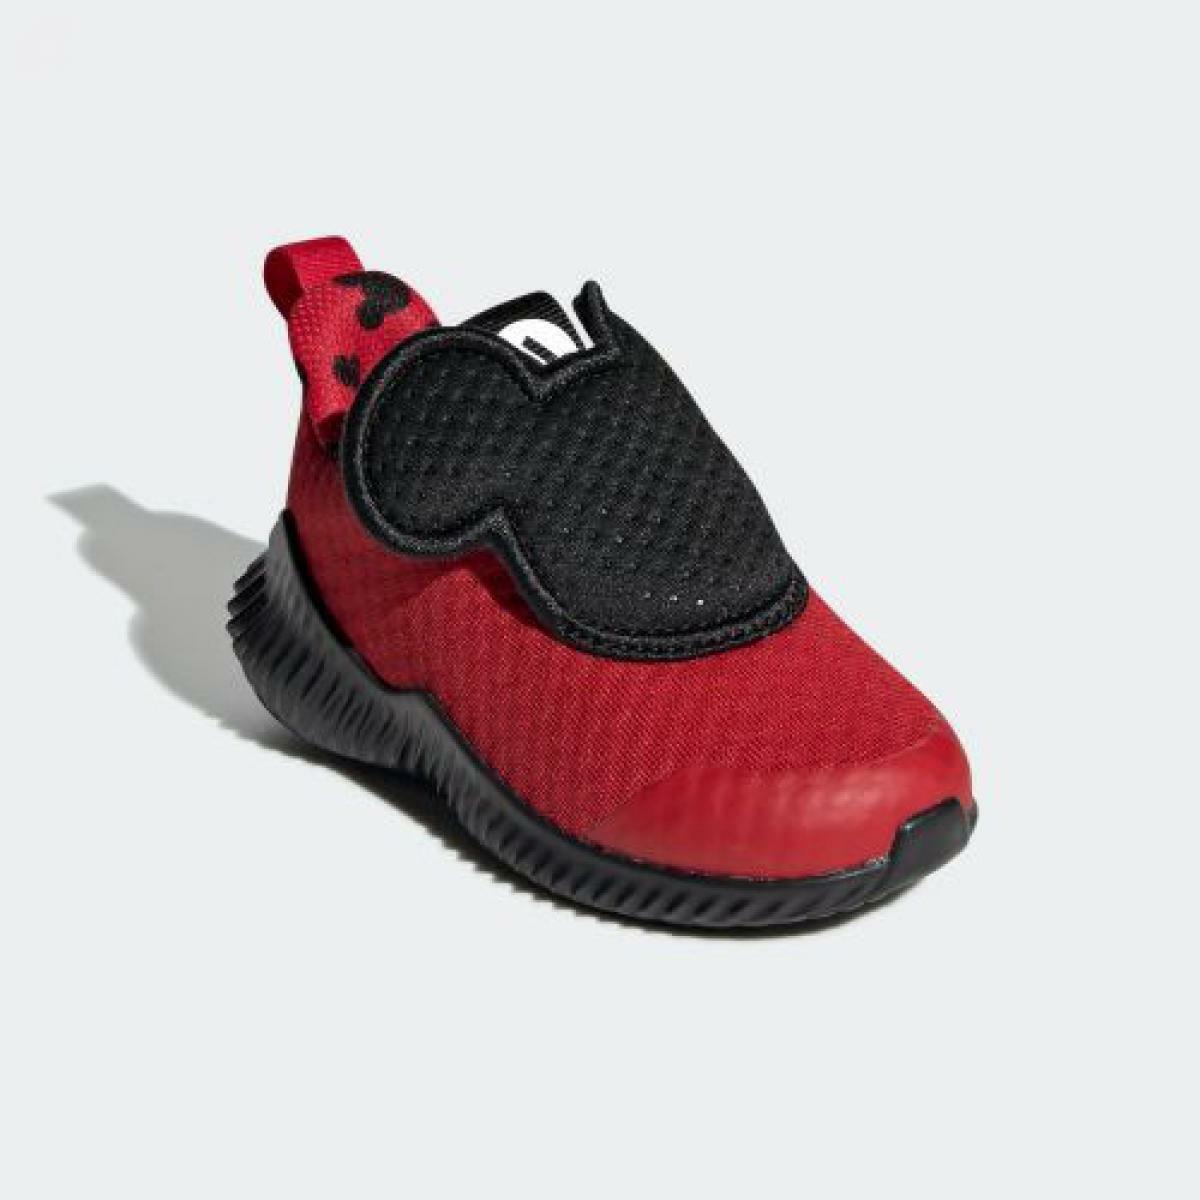 adidas X Disney FortaRun Mickey AC Red Black G27187 Little Kid's Shoes NEW